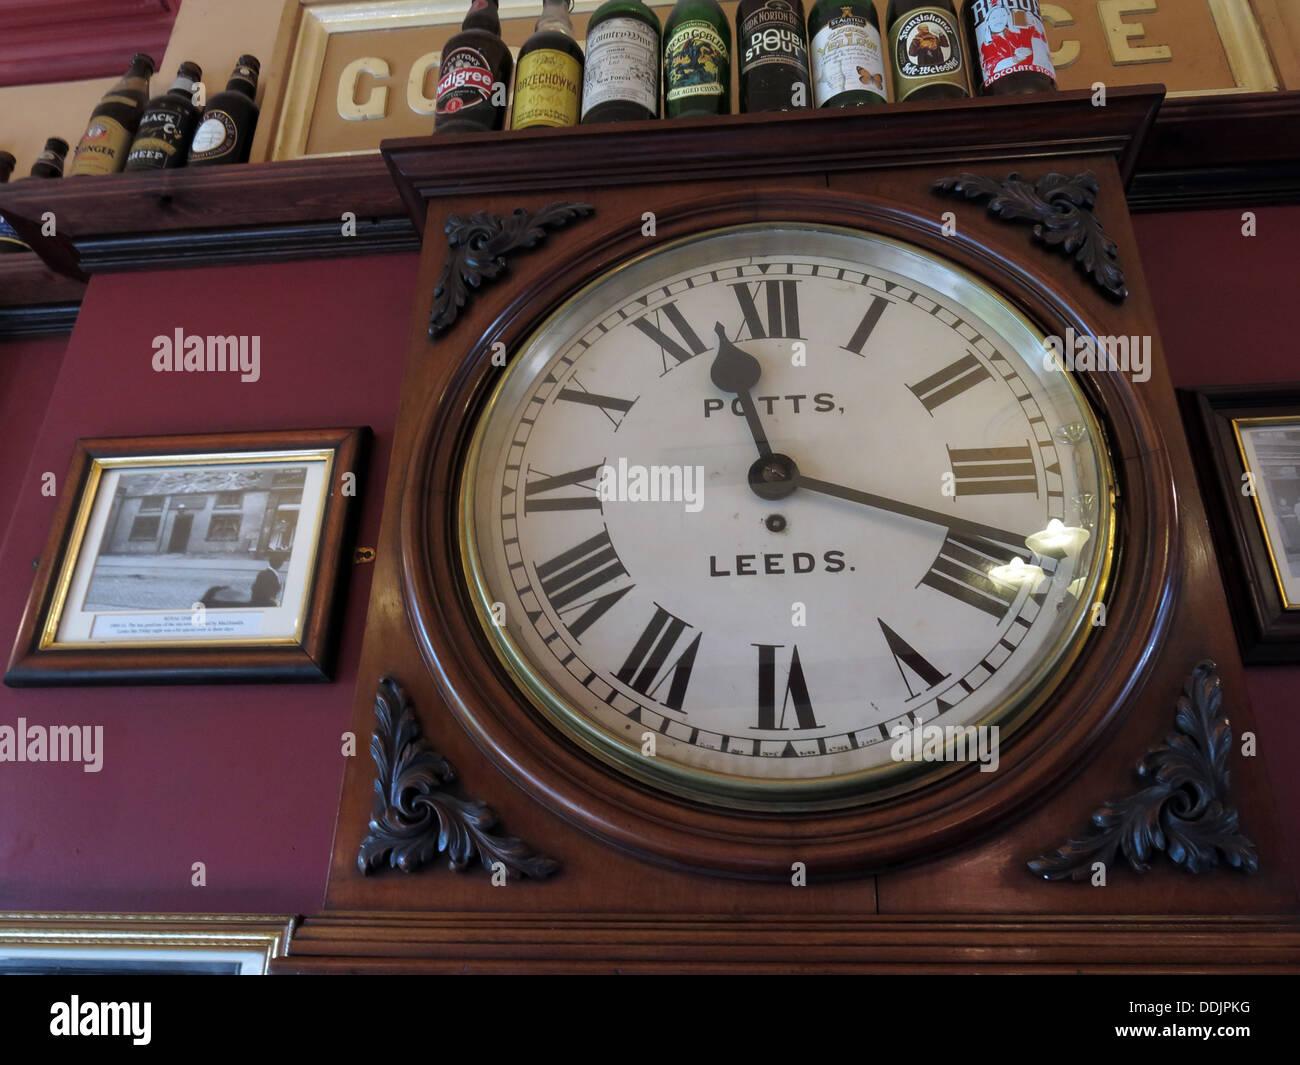 Potts Leeds clock at Dewsbury West Riding pub refreshment rooms, West Yorks, England, UK Stock Photo